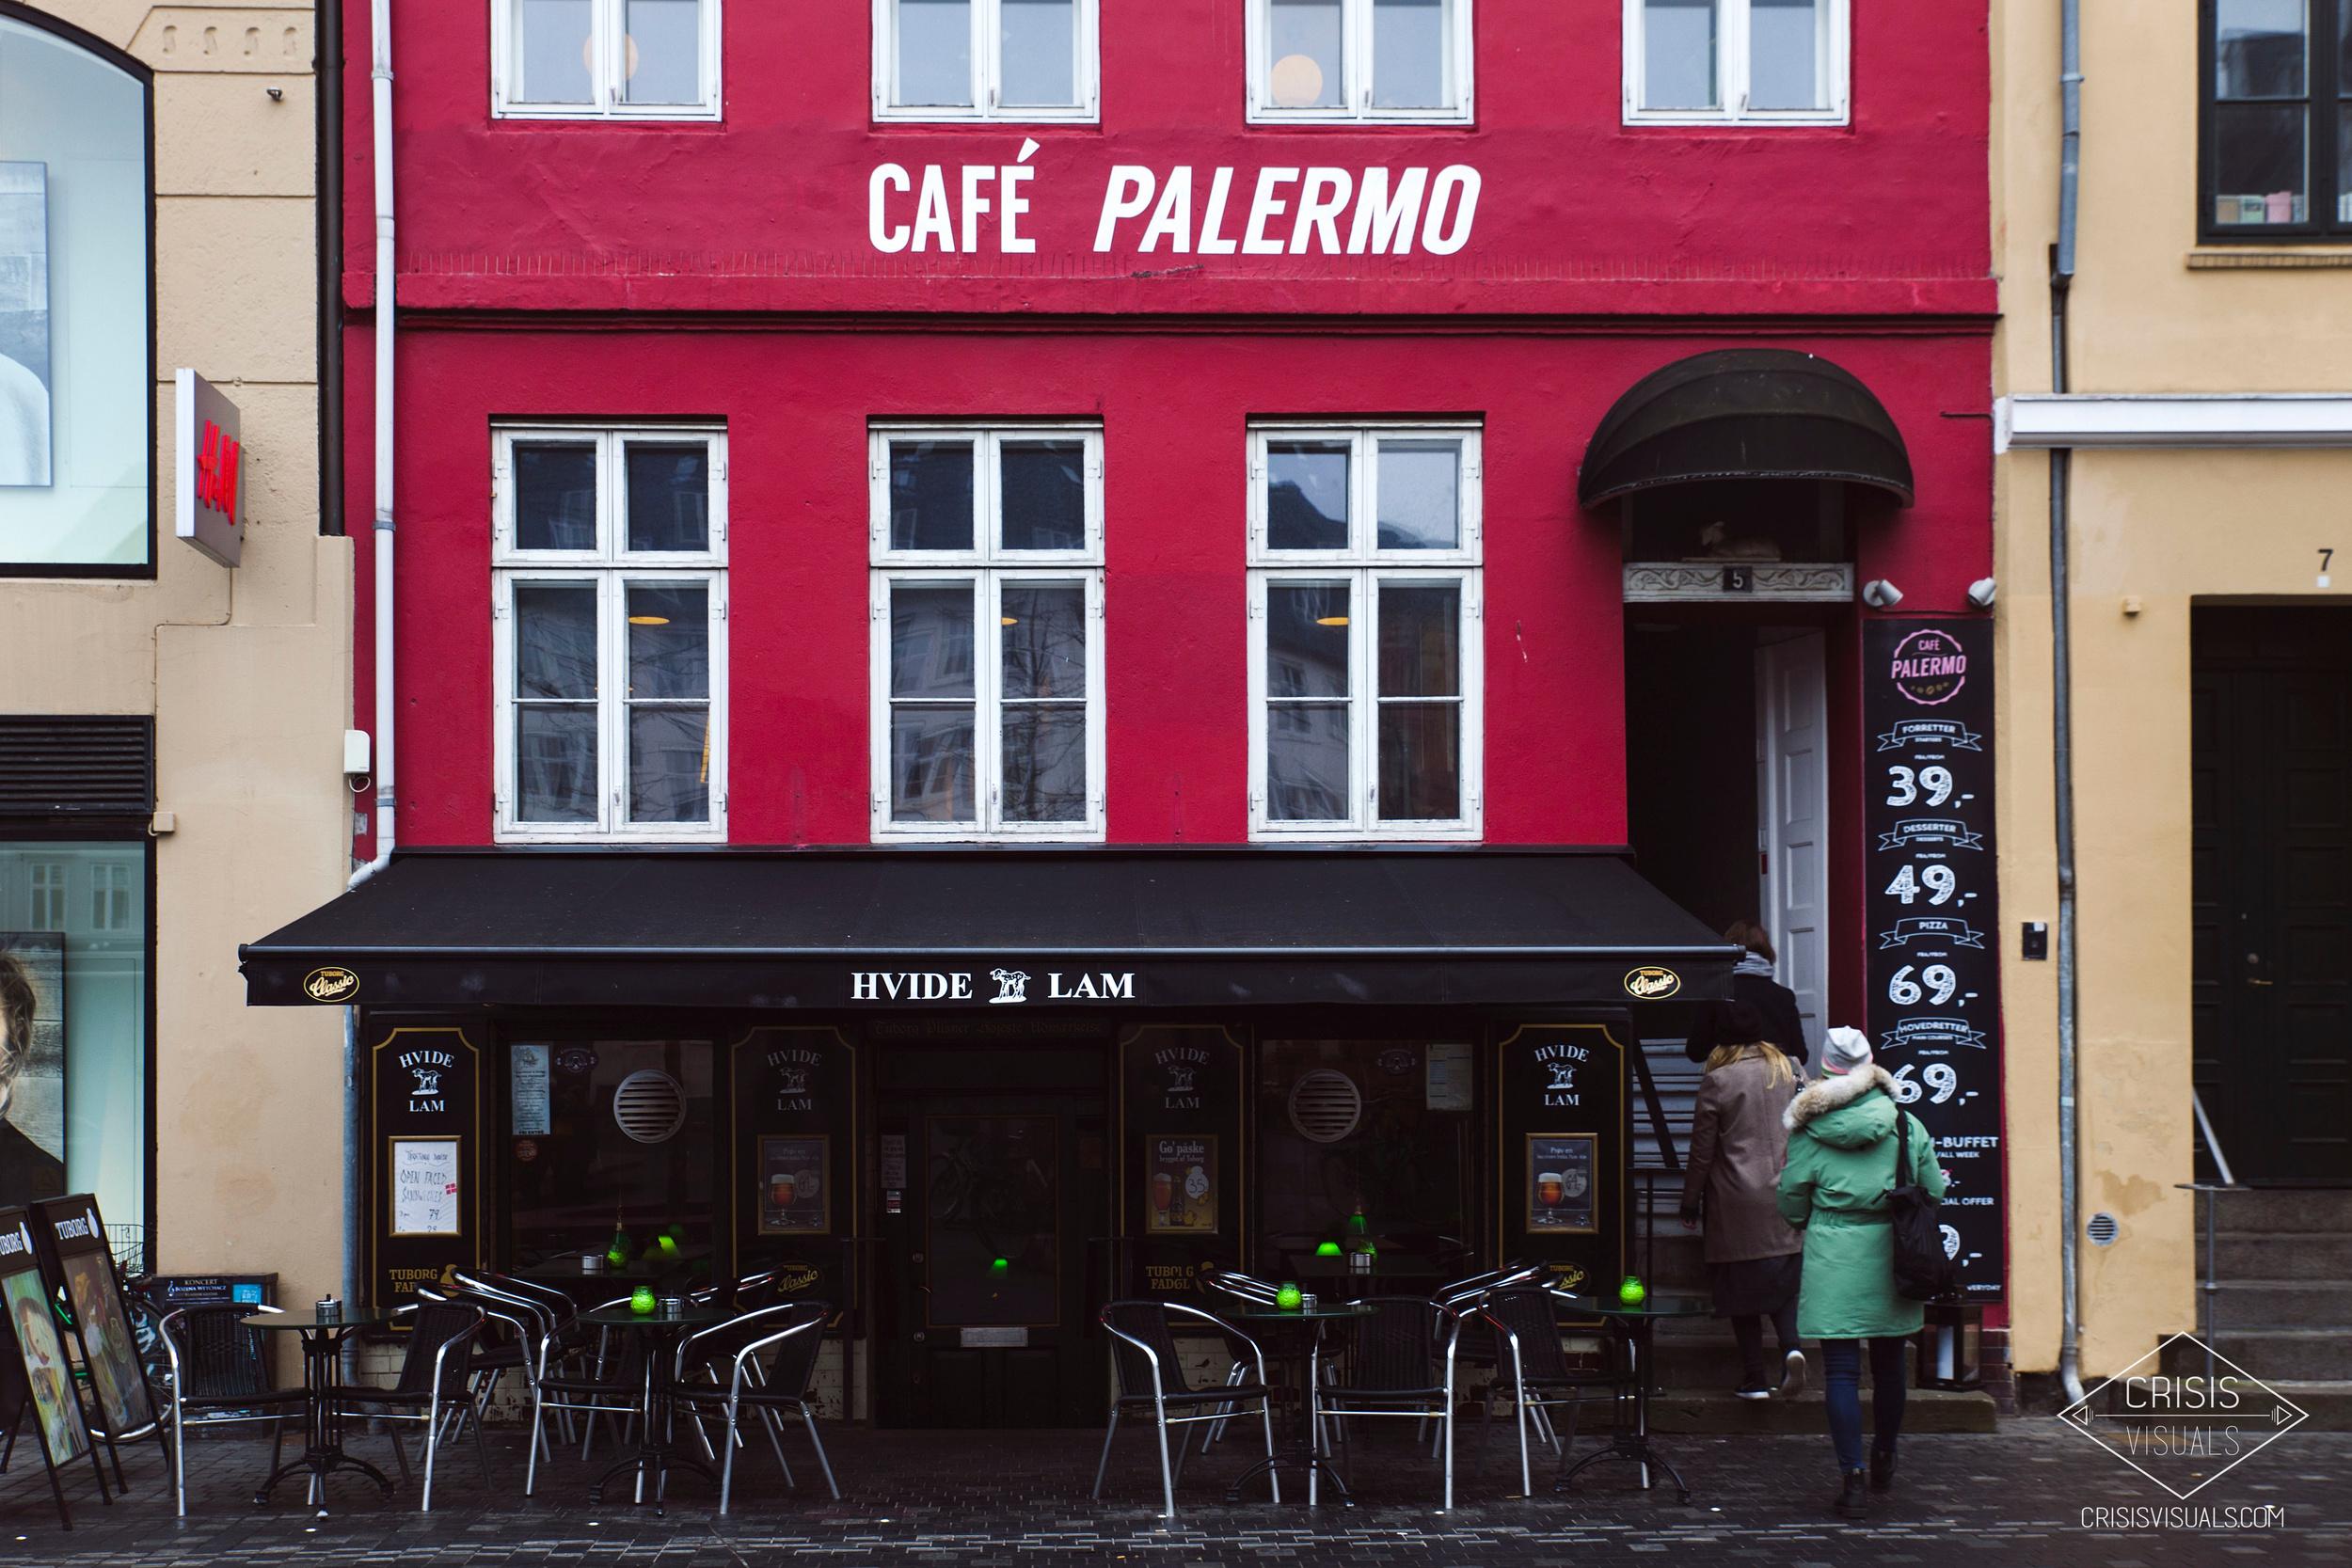 Café Palermo